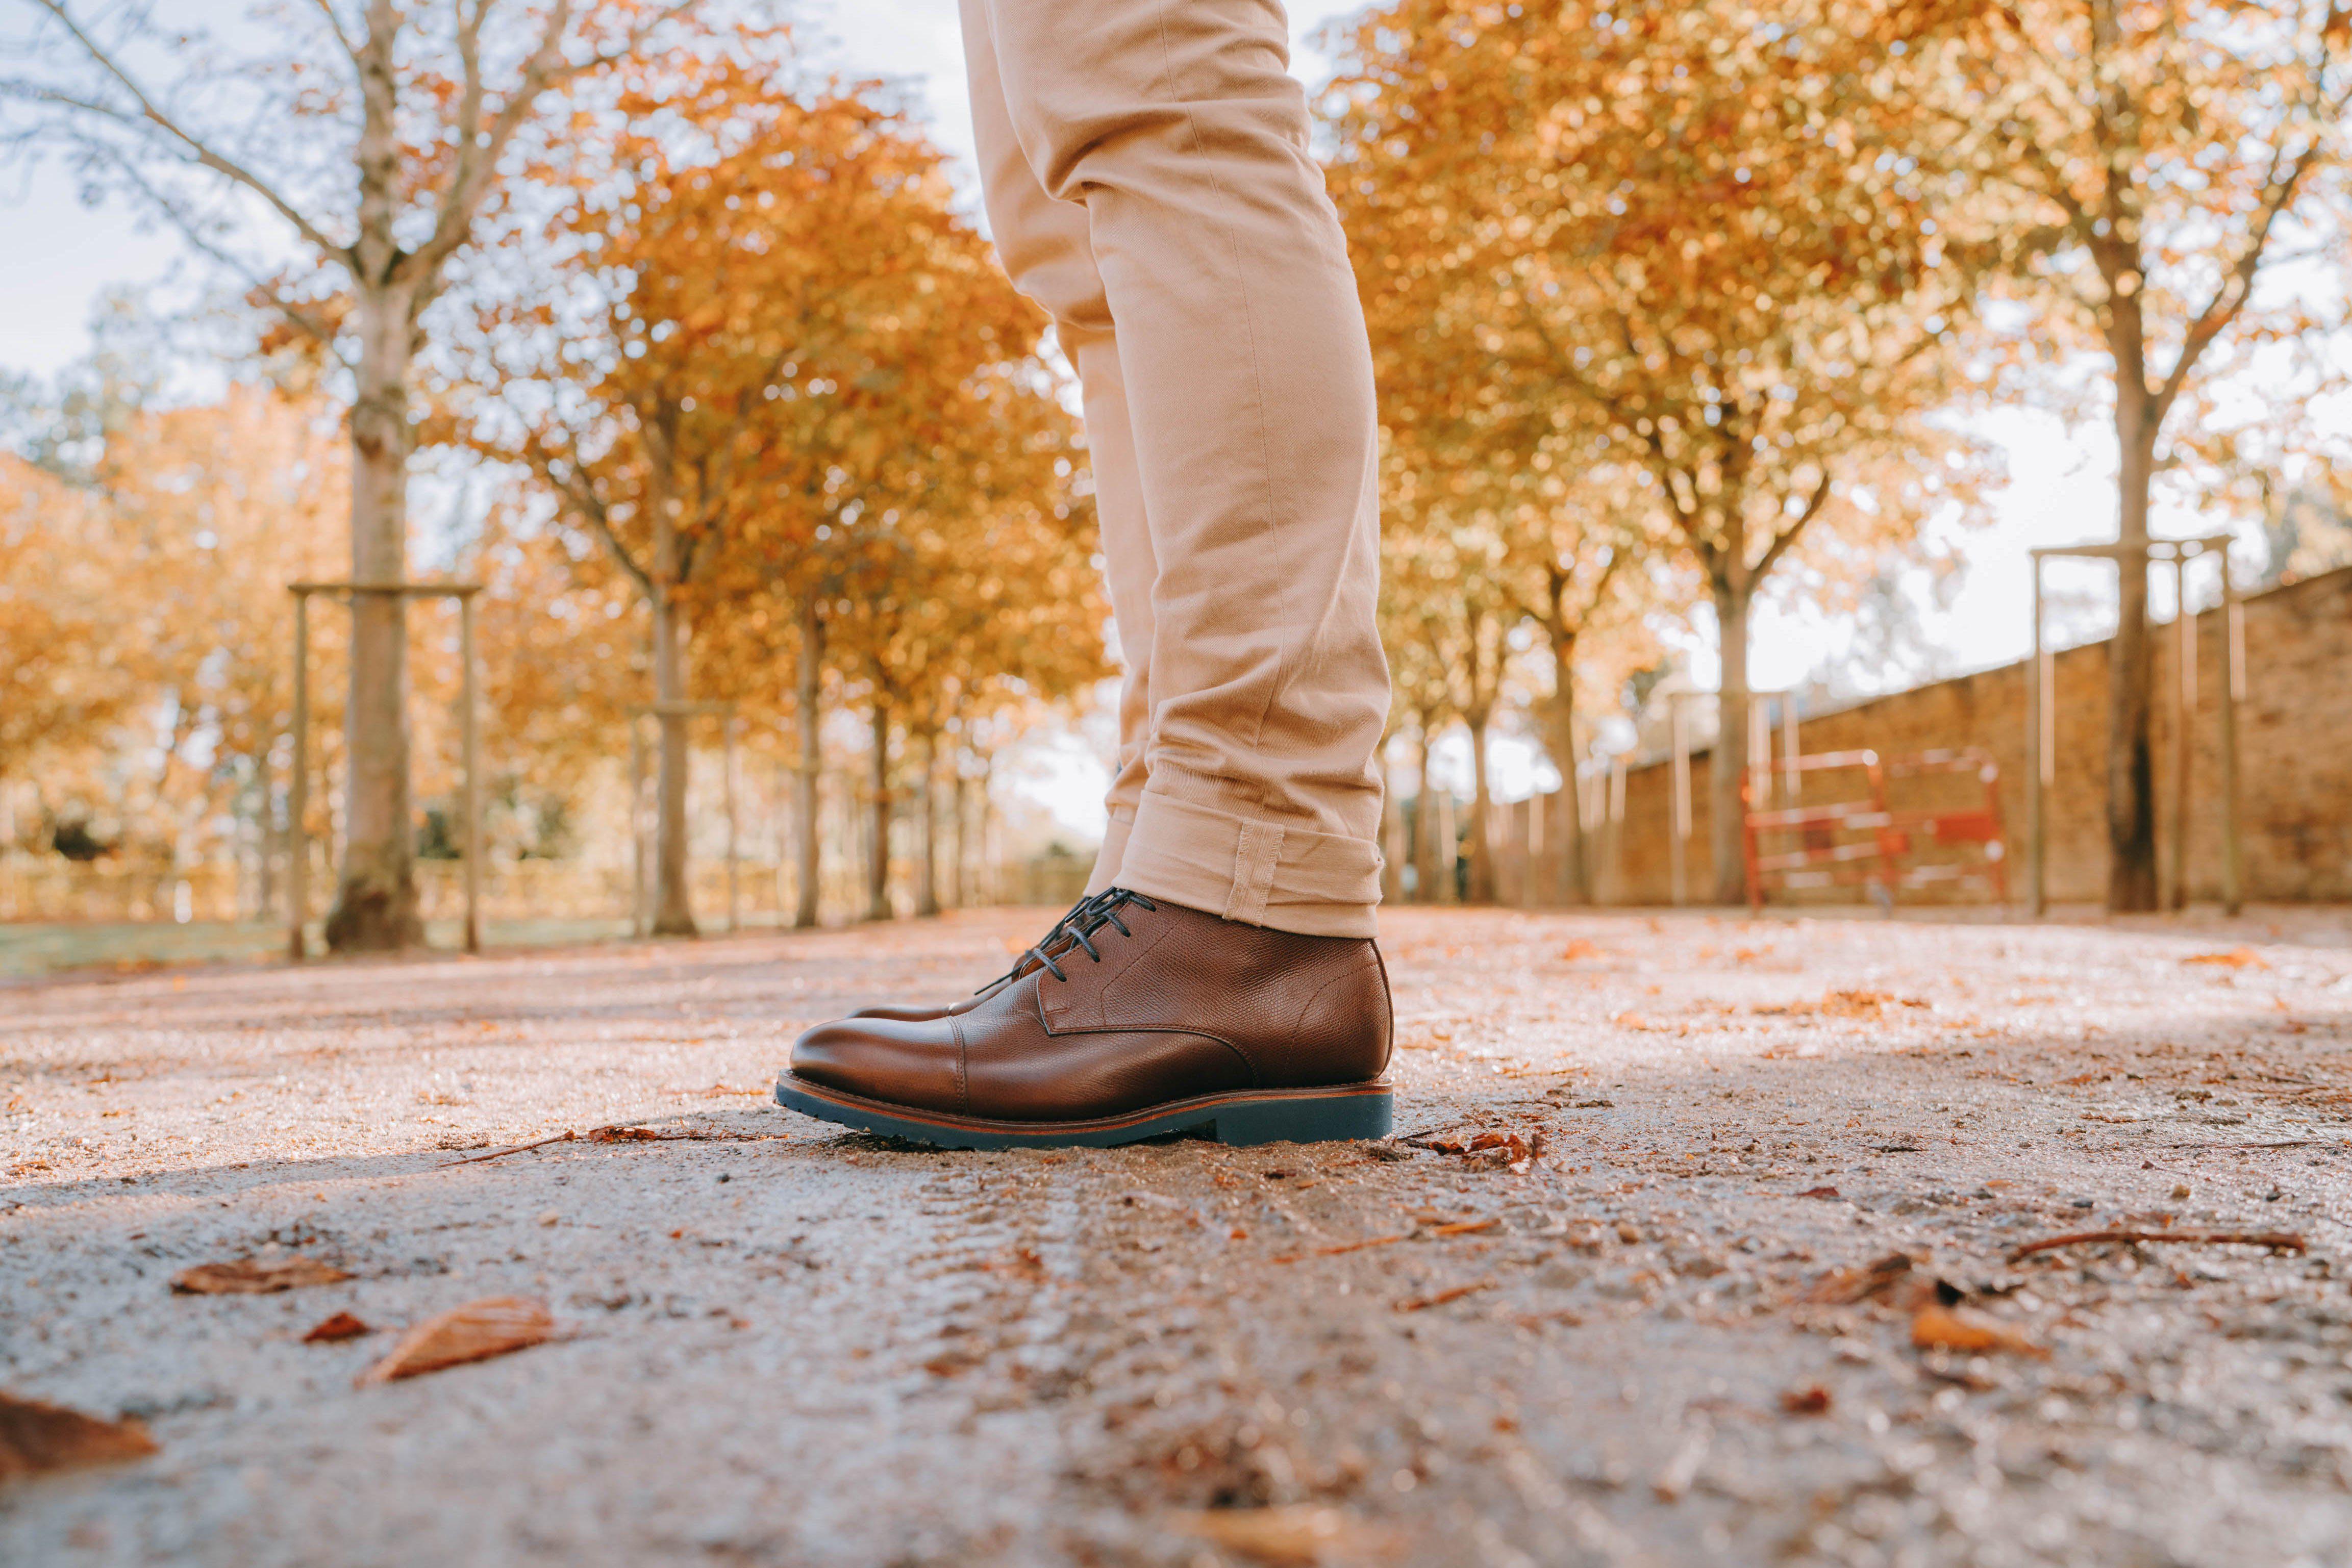 Boots hardrige hector essayage profil